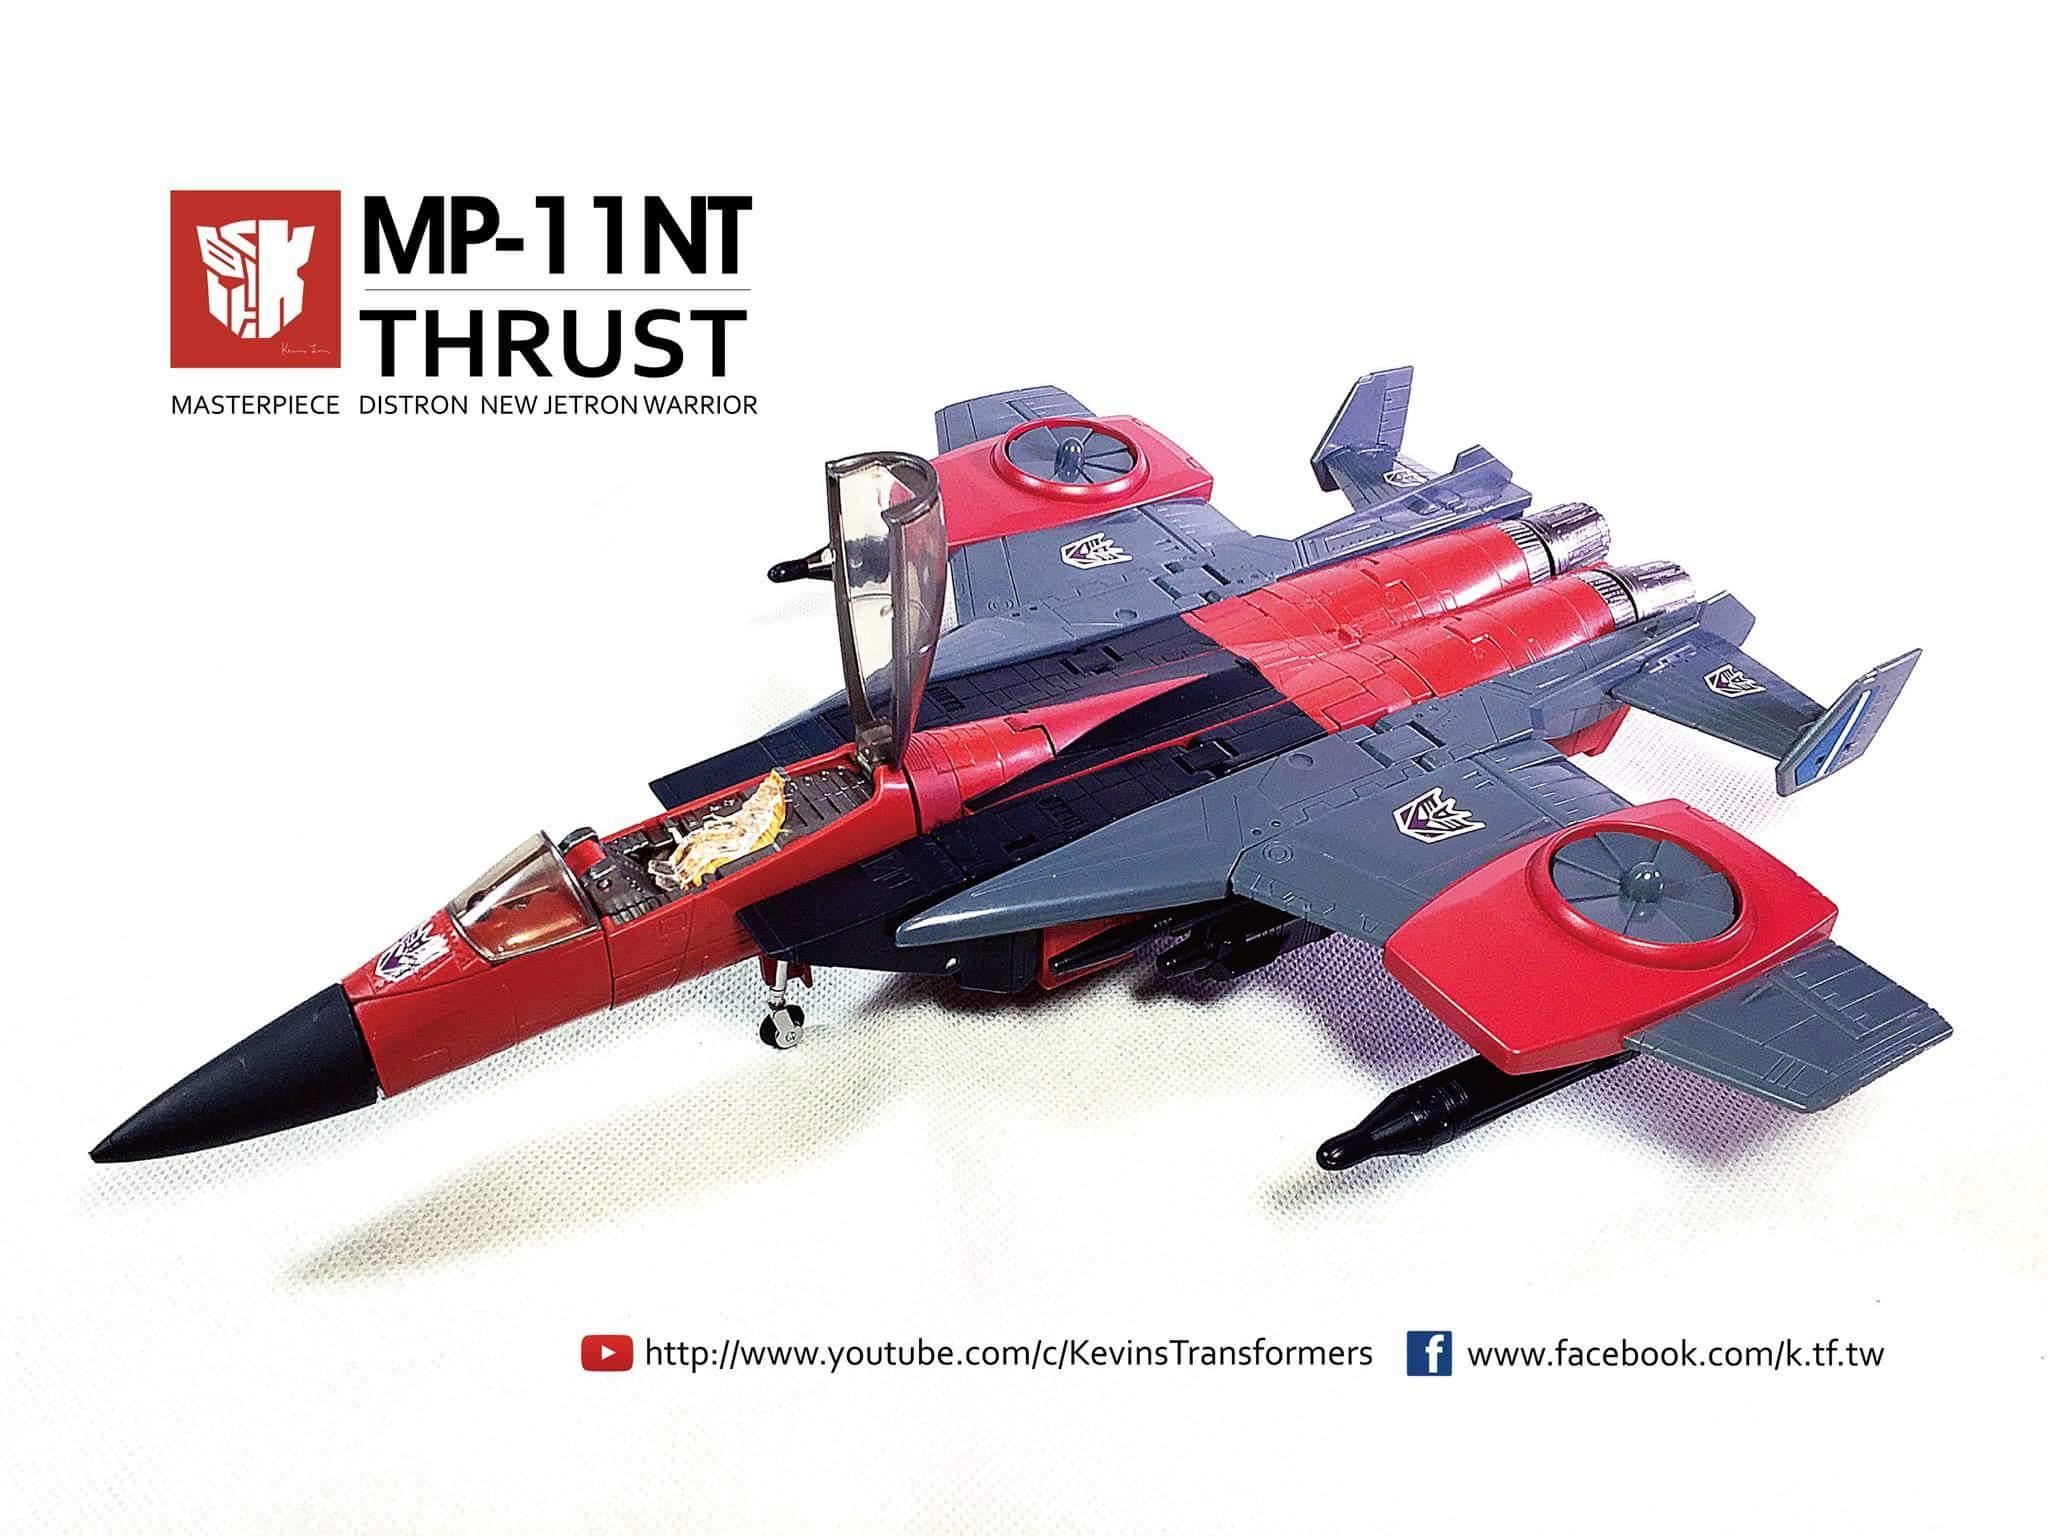 [Masterpiece] MP-11NT Thrust/Fatalo par Takara Tomy - Page 2 4UxN11lI